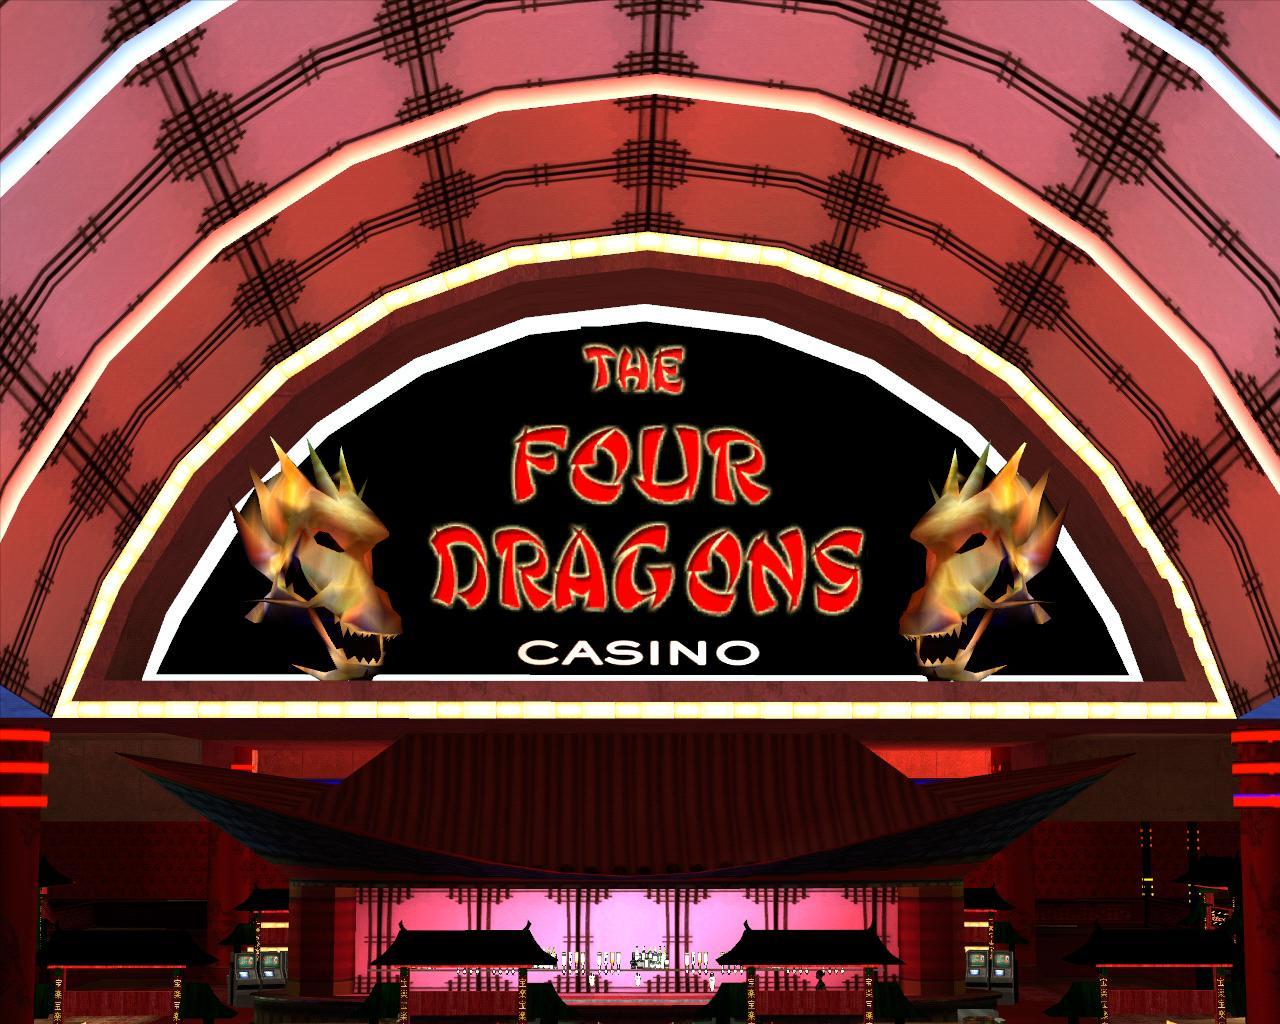 The four dragons casino m-gambling